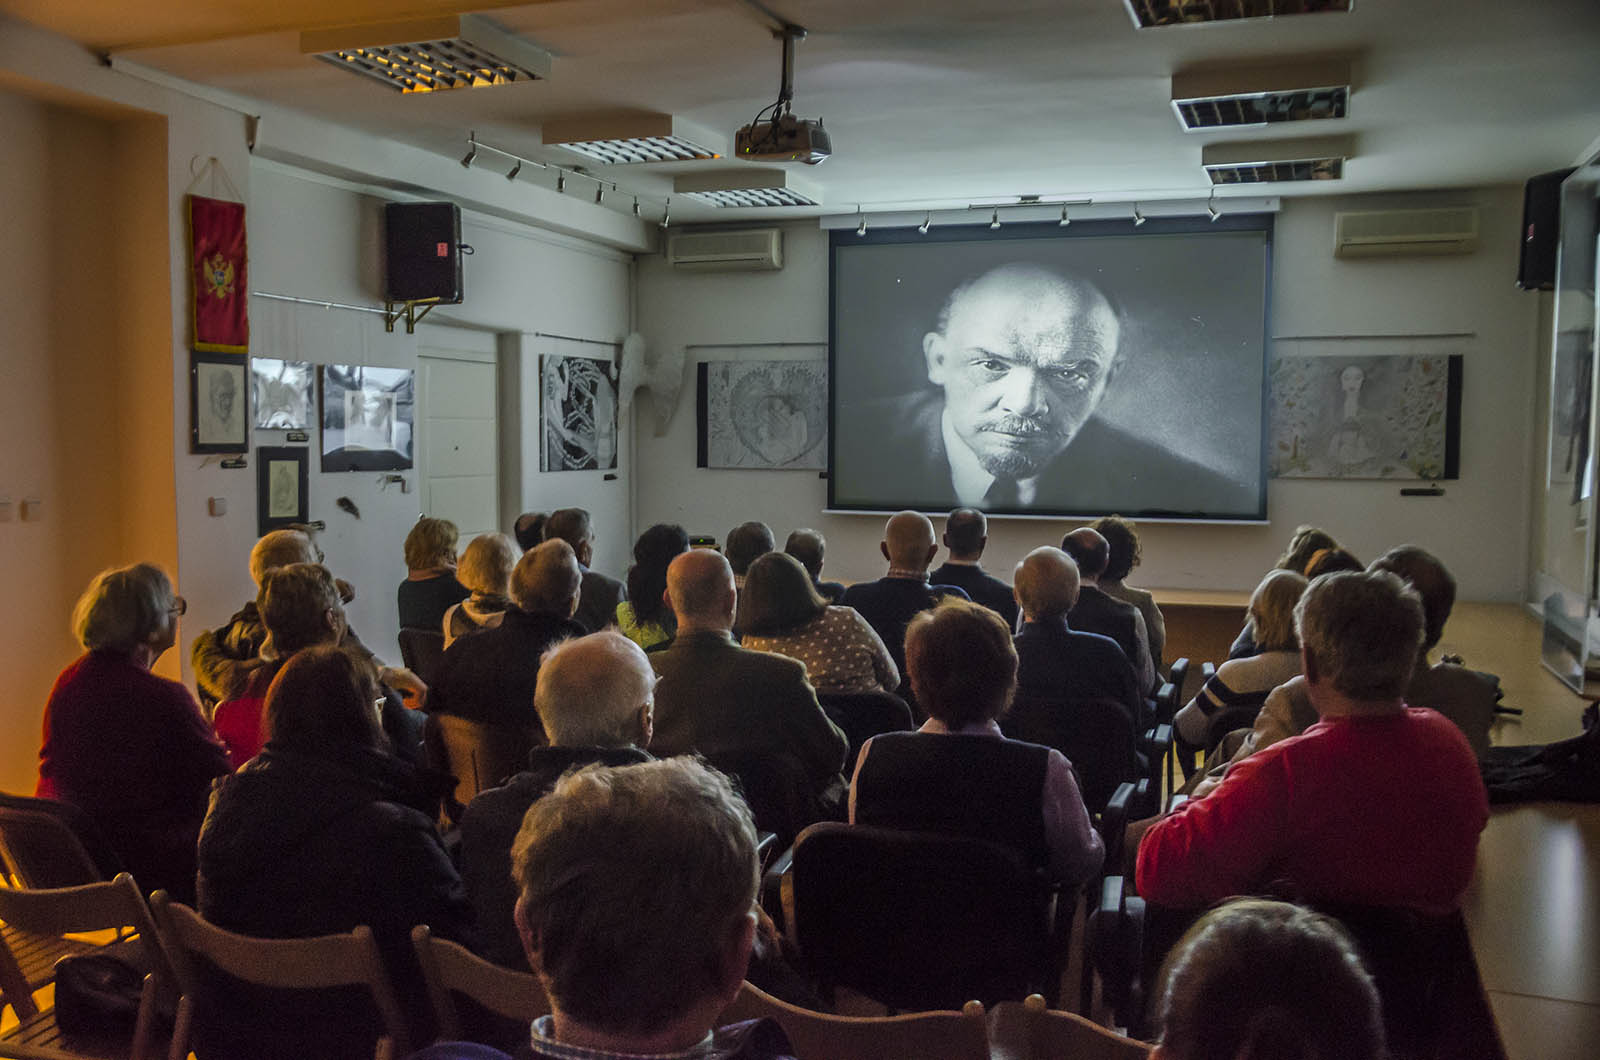 Projekcija Filma U Klubu Crnogoraca 6